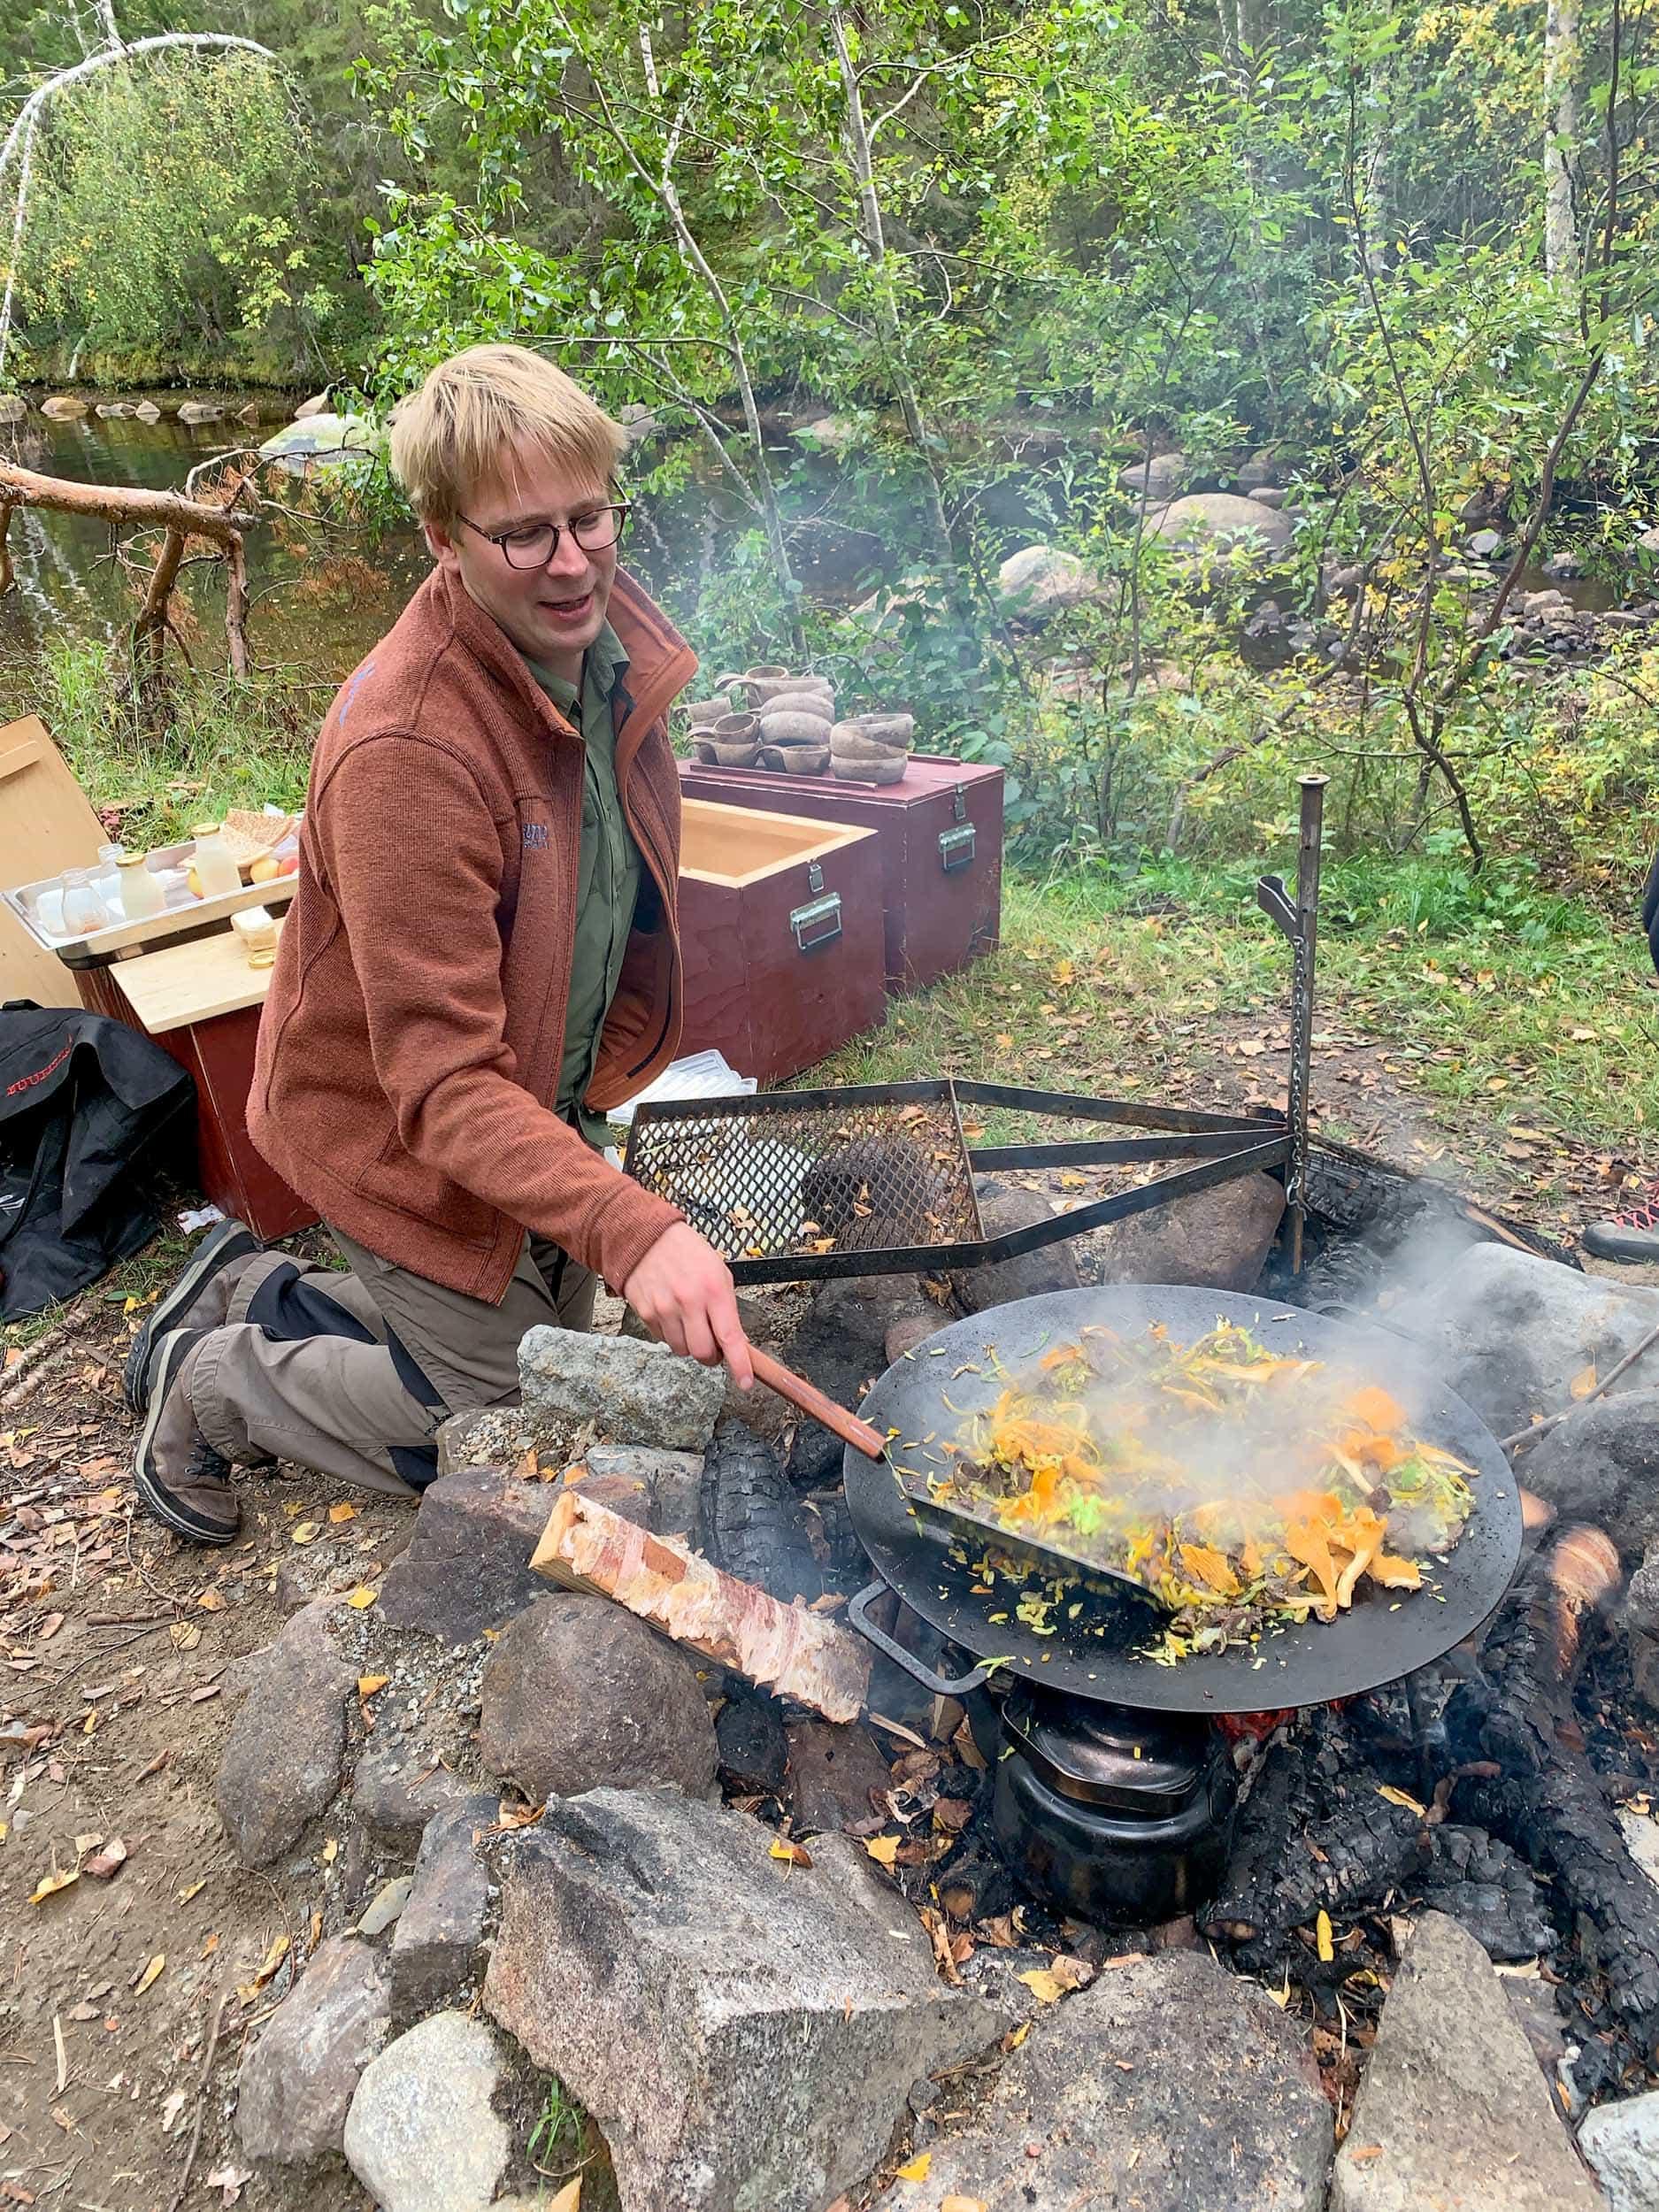 Cooking up a moose stir fry